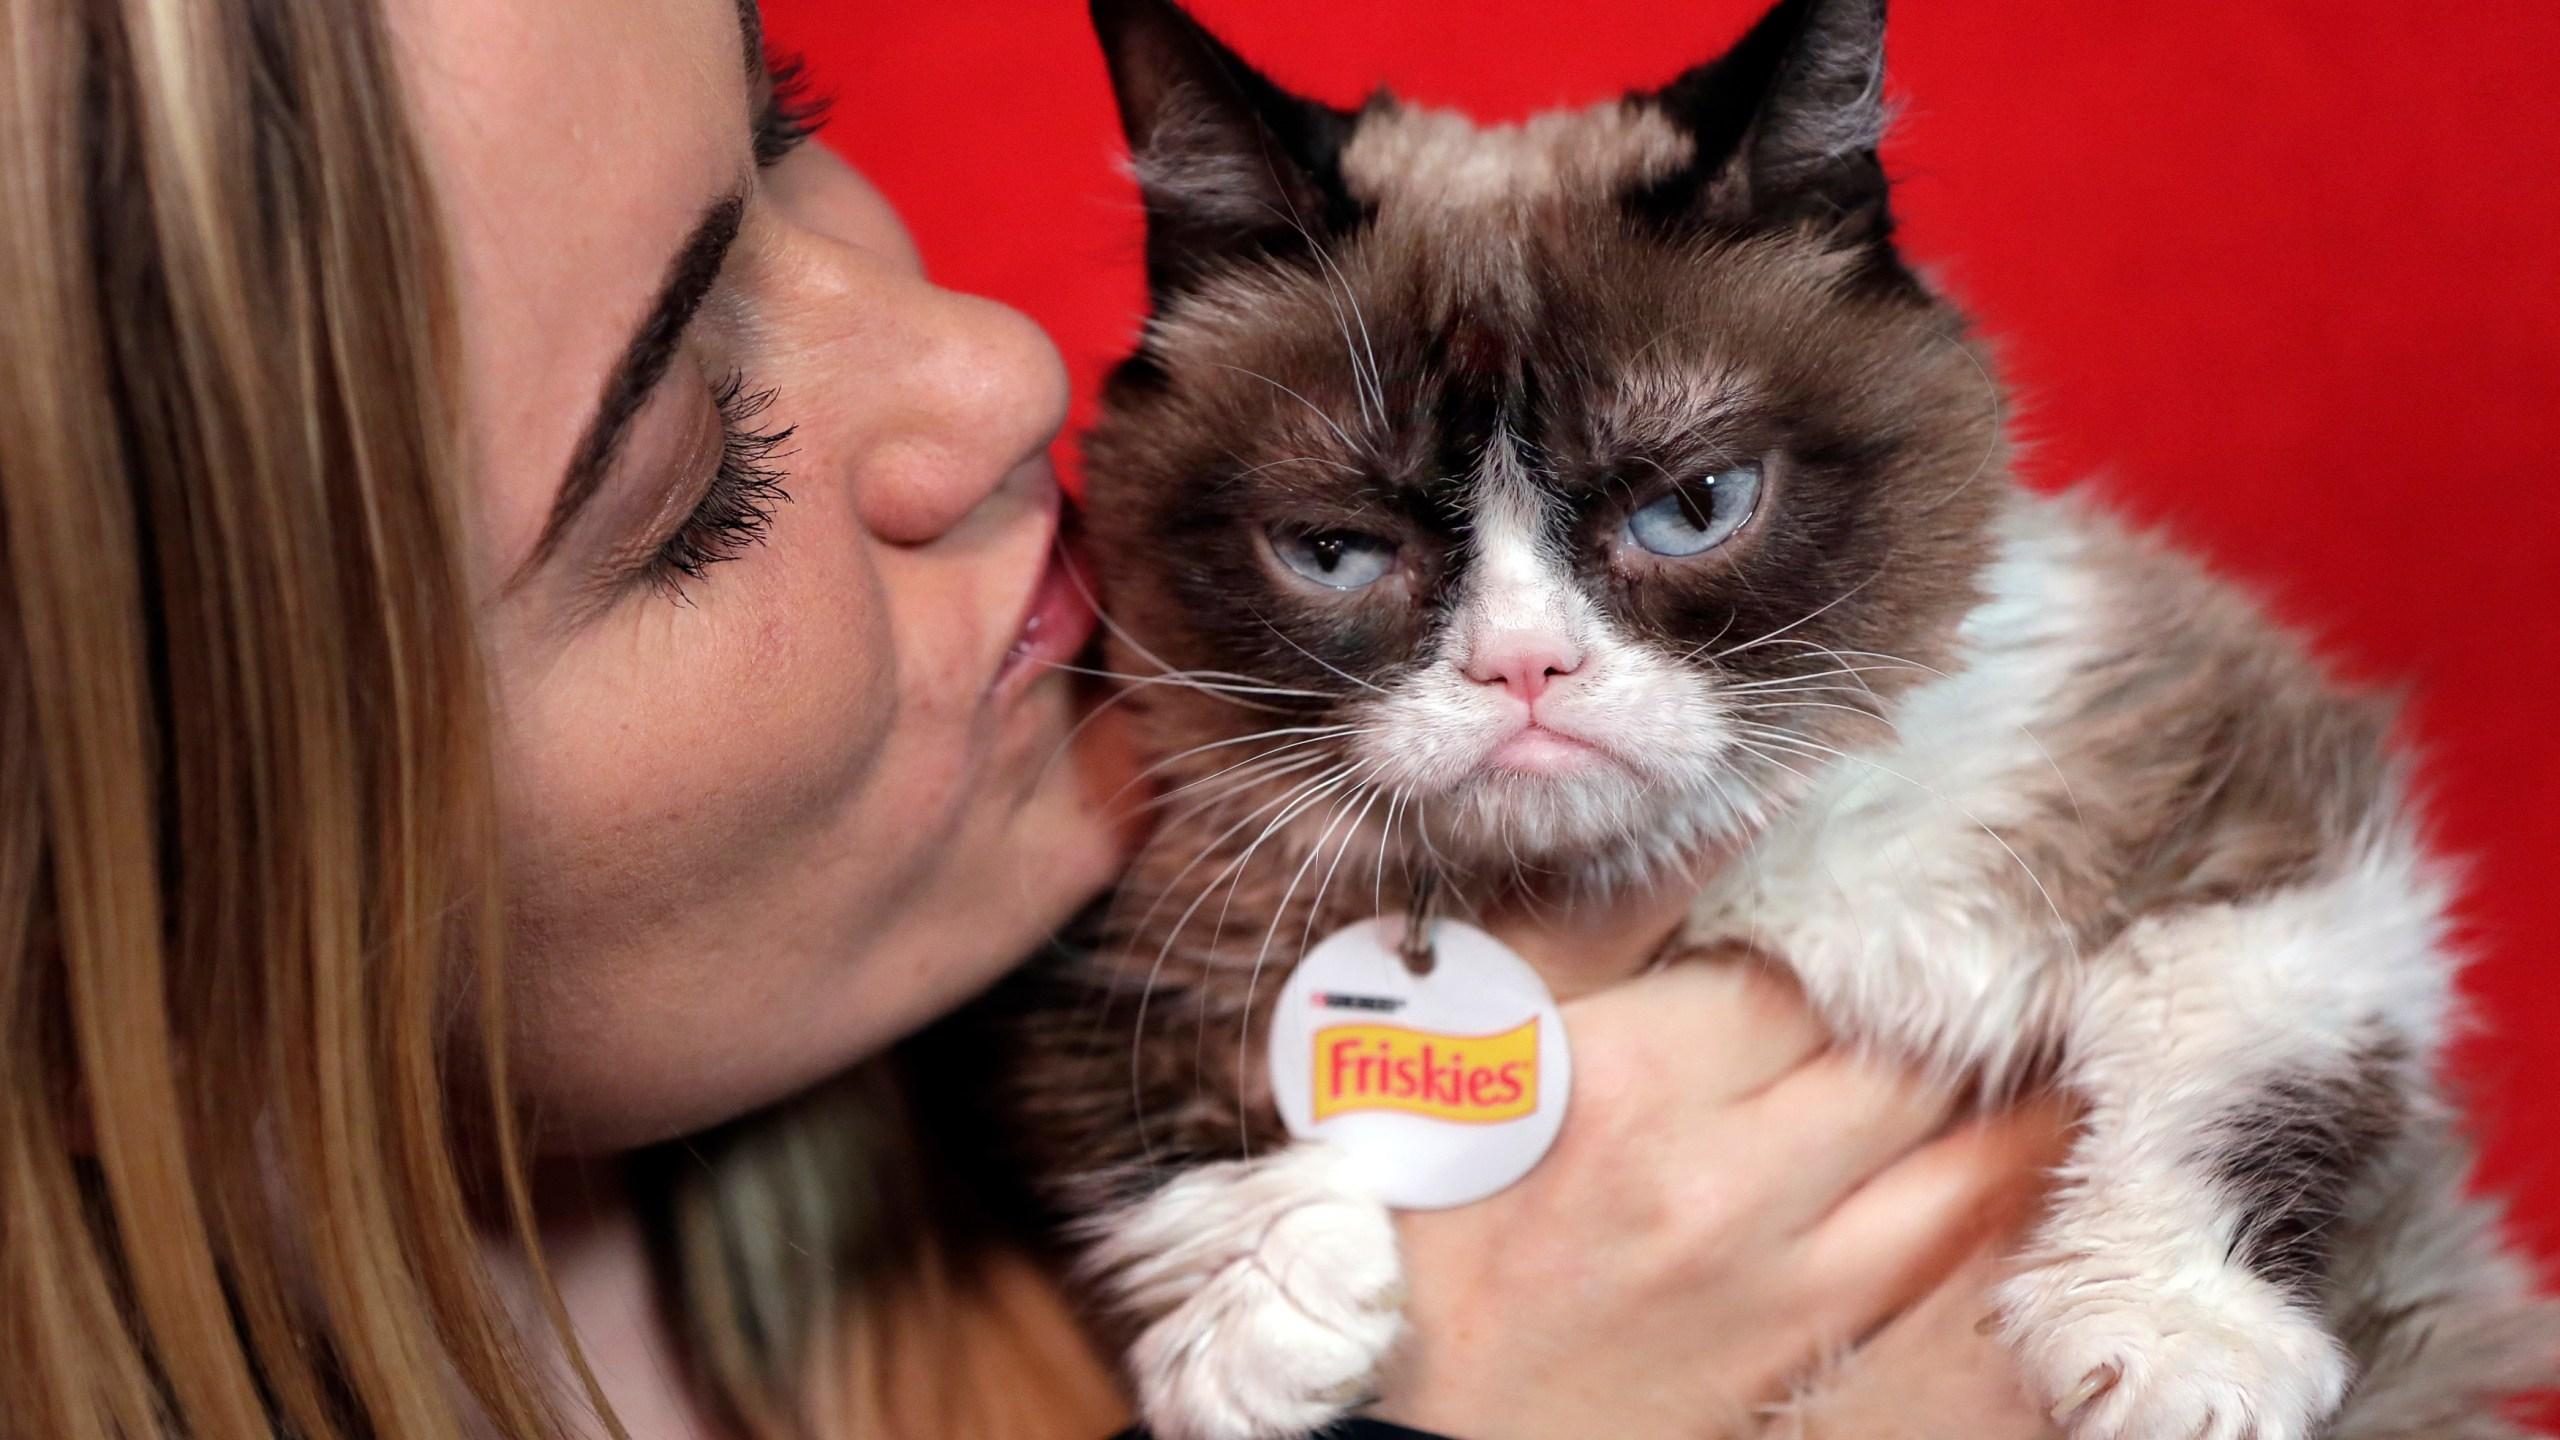 Grumpy_Cat_Coffee_Lawsuit_56493-159532.jpg85260583